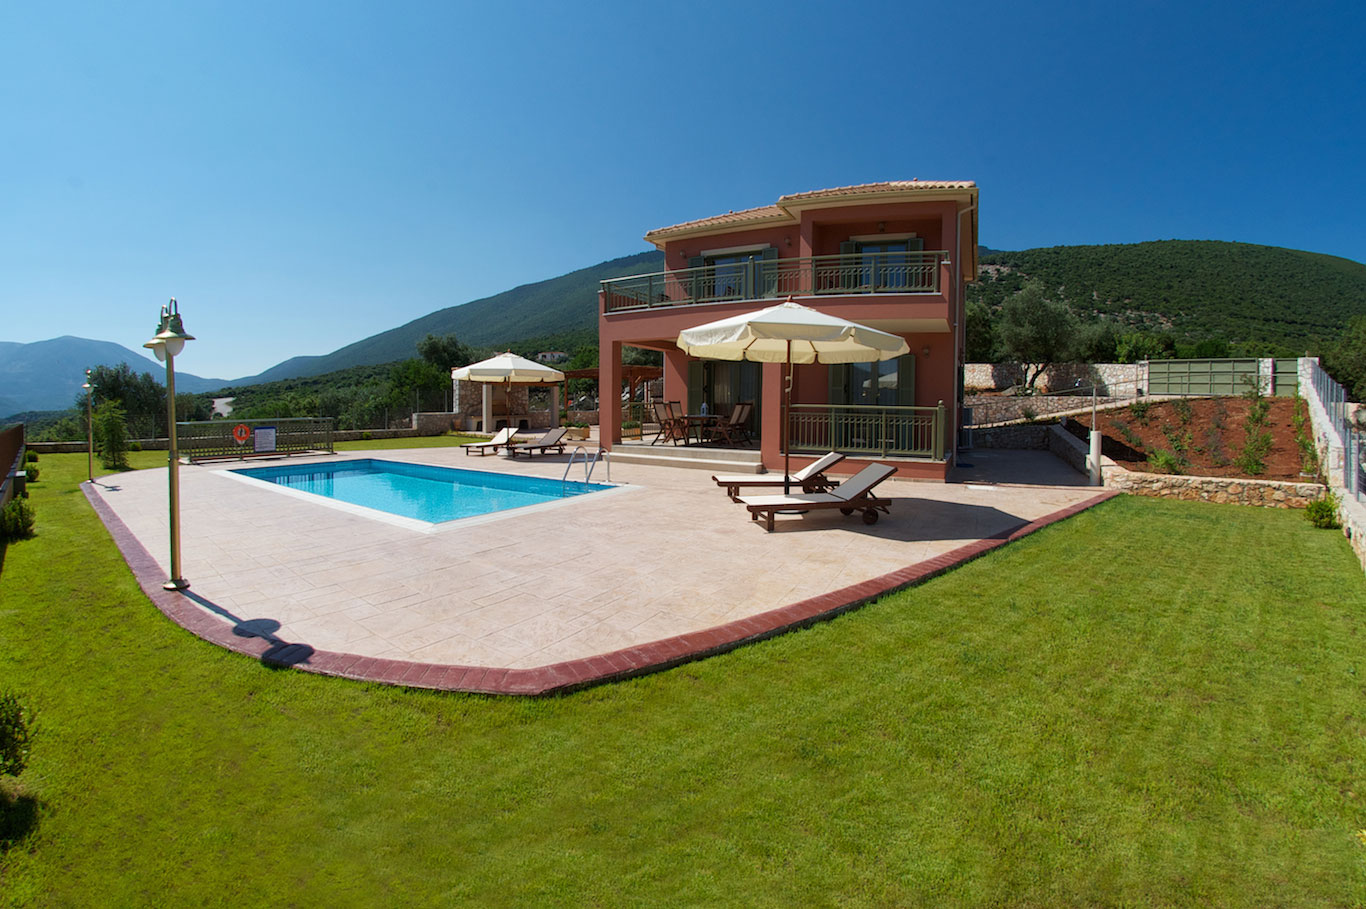 Kefalonia Villas - Luxury Villas in Kefalonia | Kefalonia villa Niraeus in Sami Kefalonia